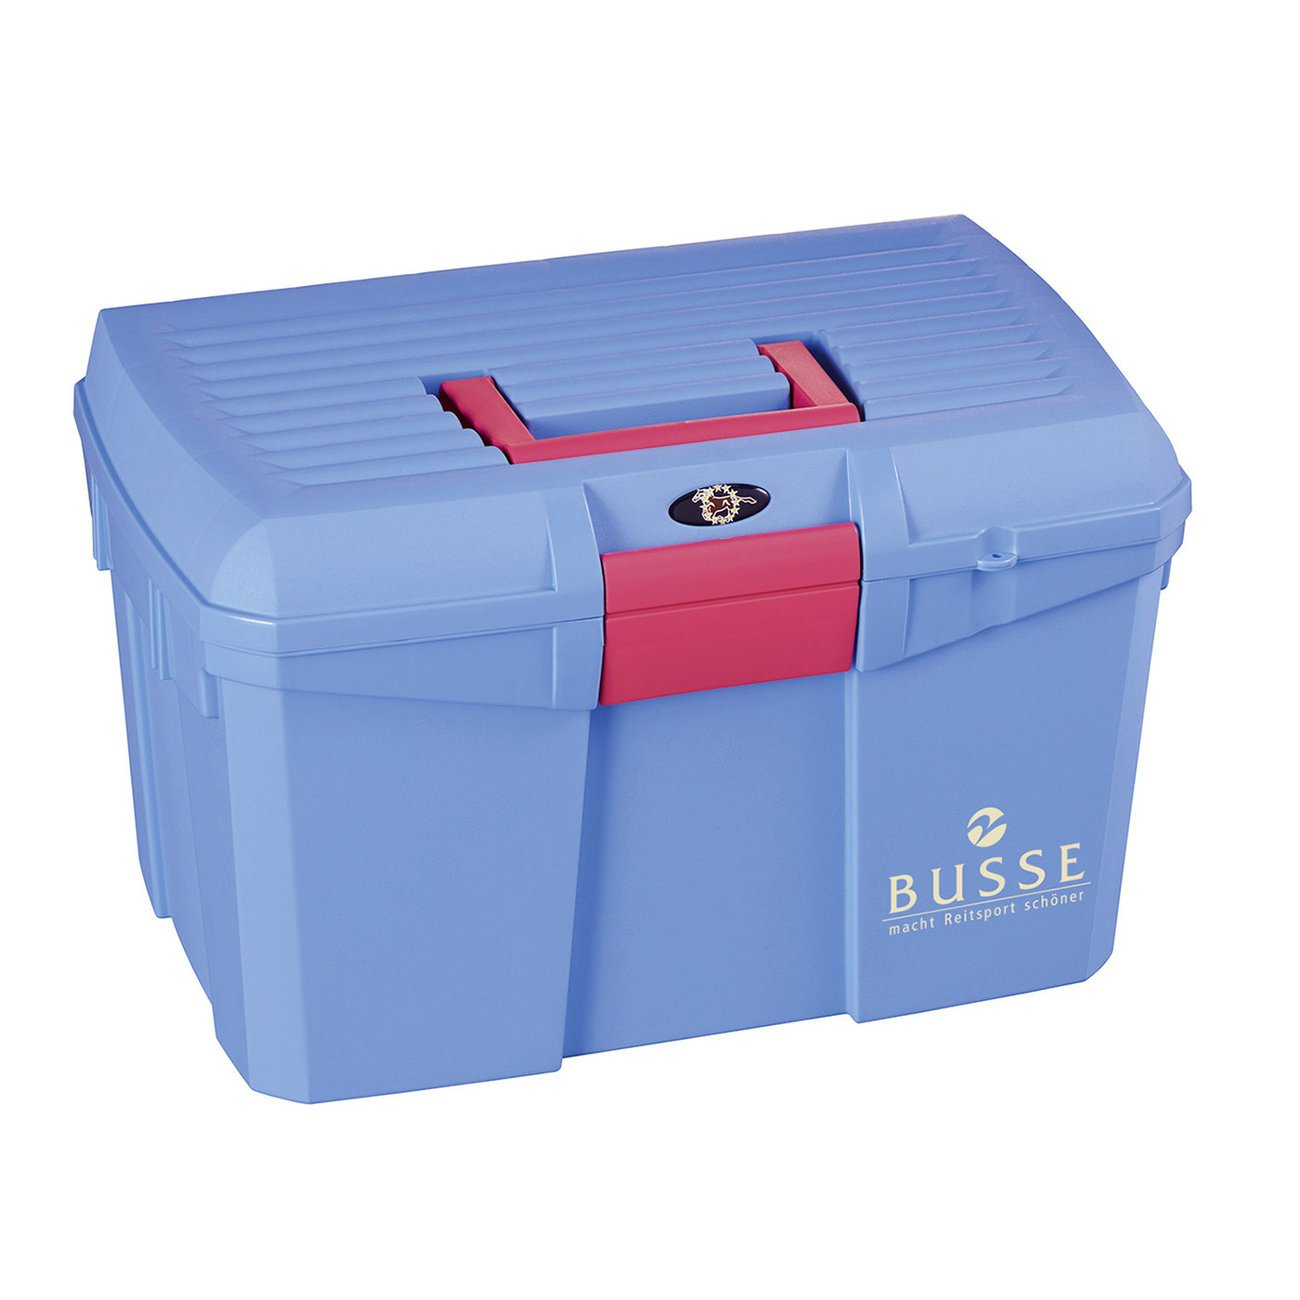 BUSSE Pferde Putzbox Tipico, Bild 4